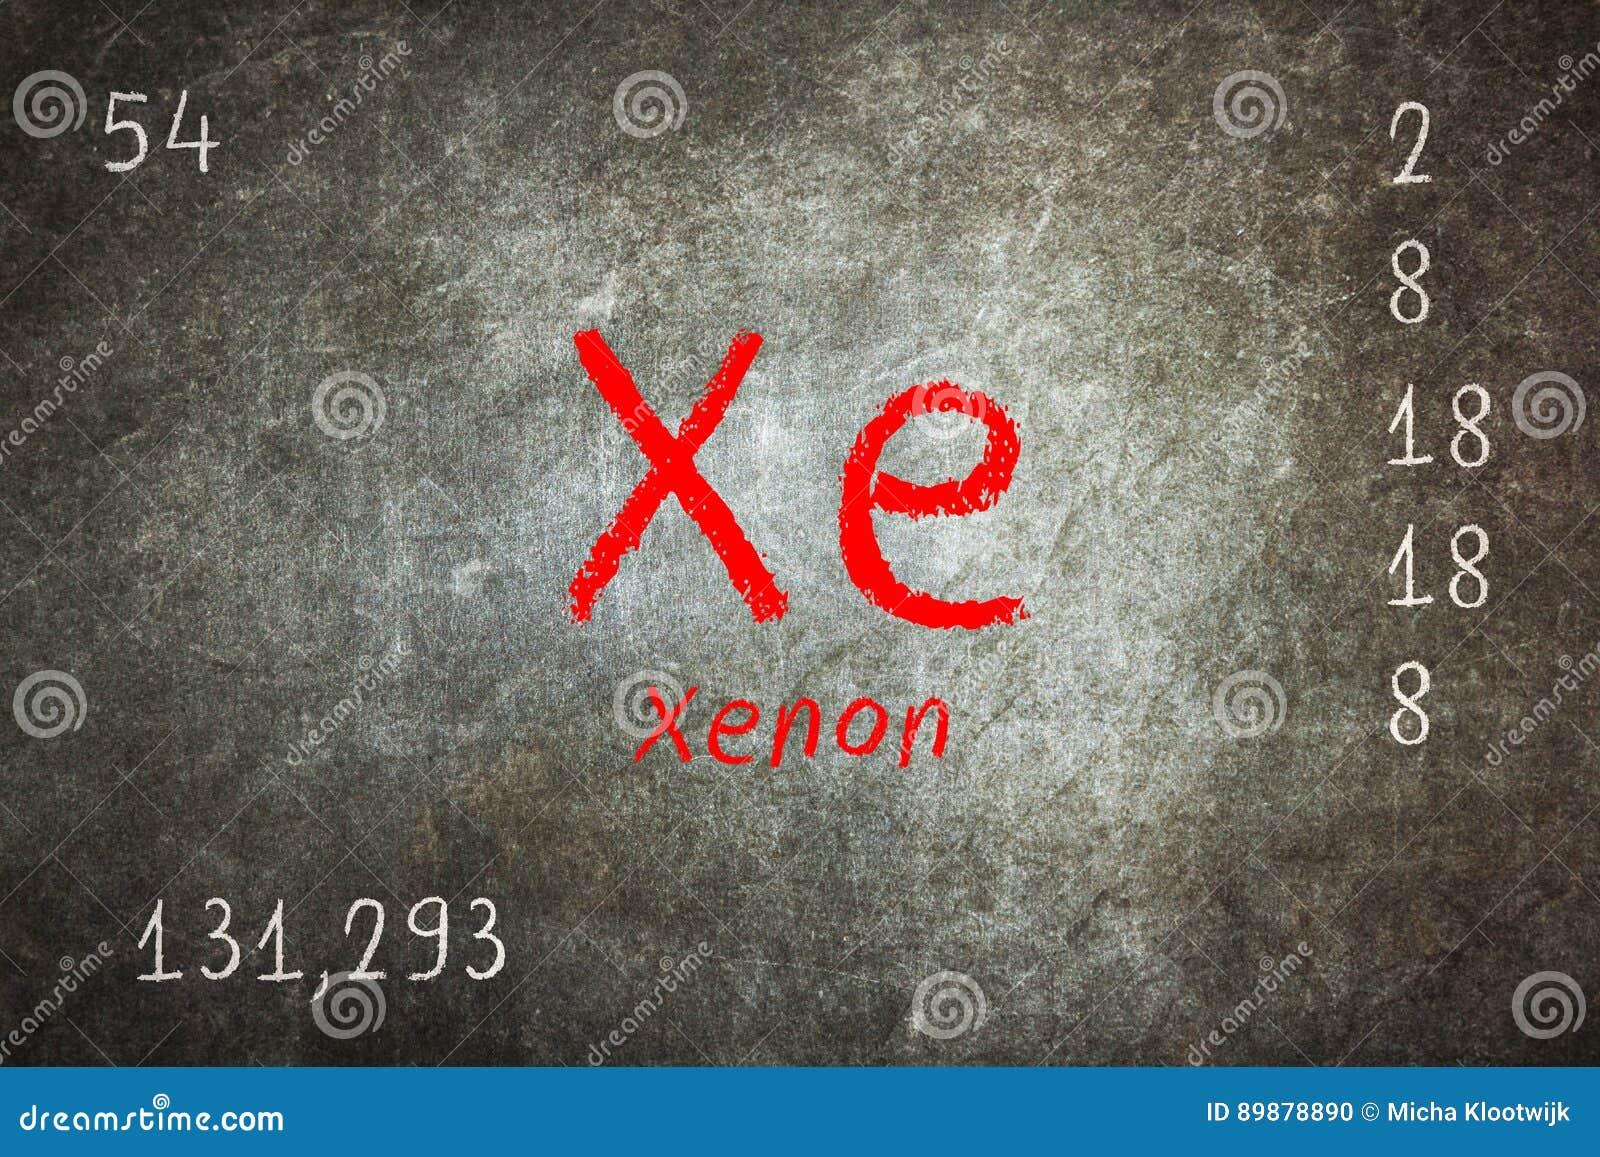 Pizarra con la tabla peridica xenn stock de ilustracin download pizarra con la tabla peridica xenn stock de ilustracin ilustracin de brillante urtaz Choice Image